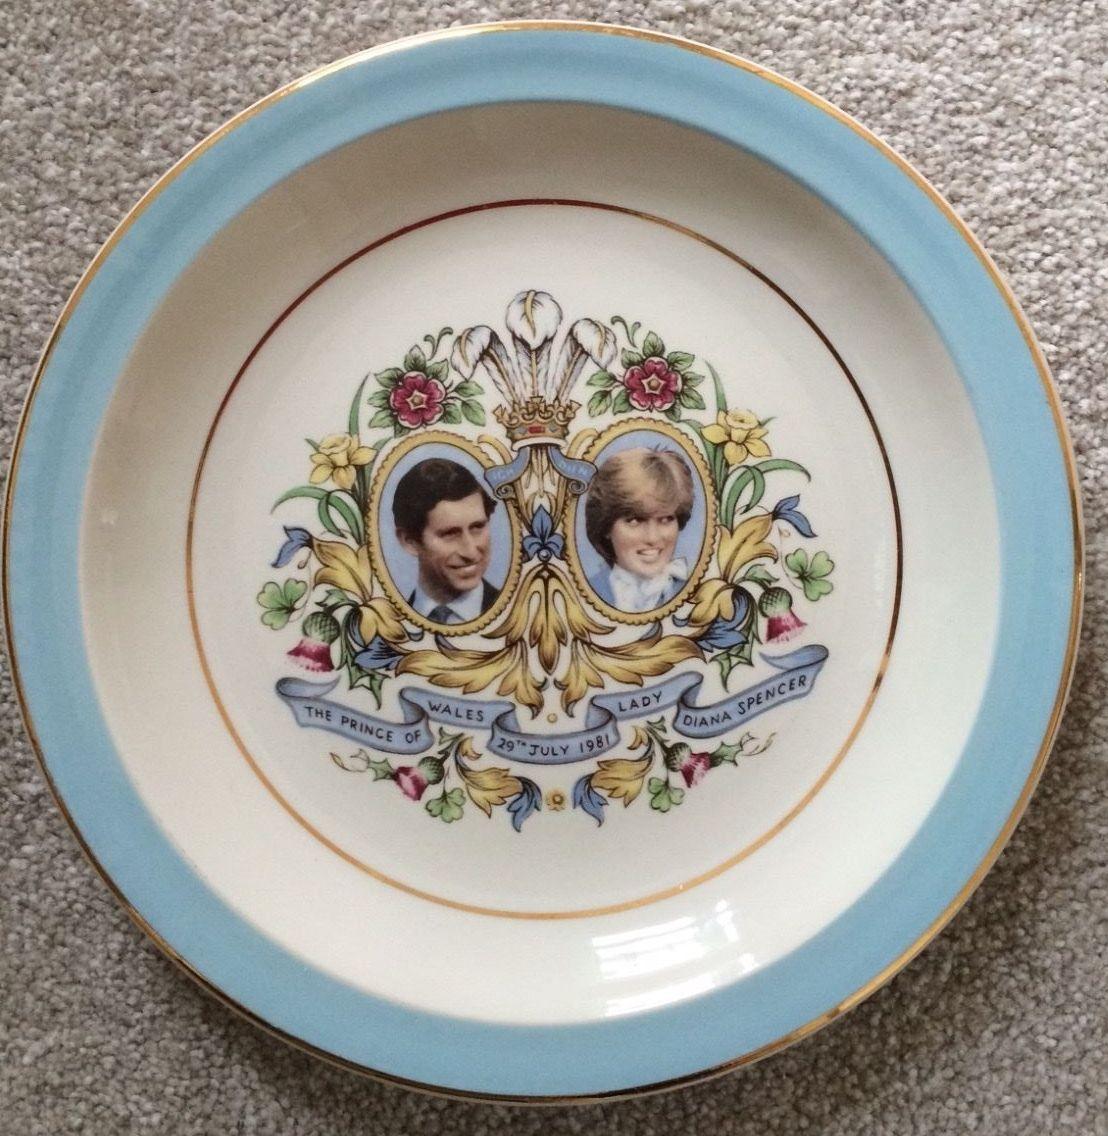 The ROYAL WEDDING Official Souvenir Prince Charles